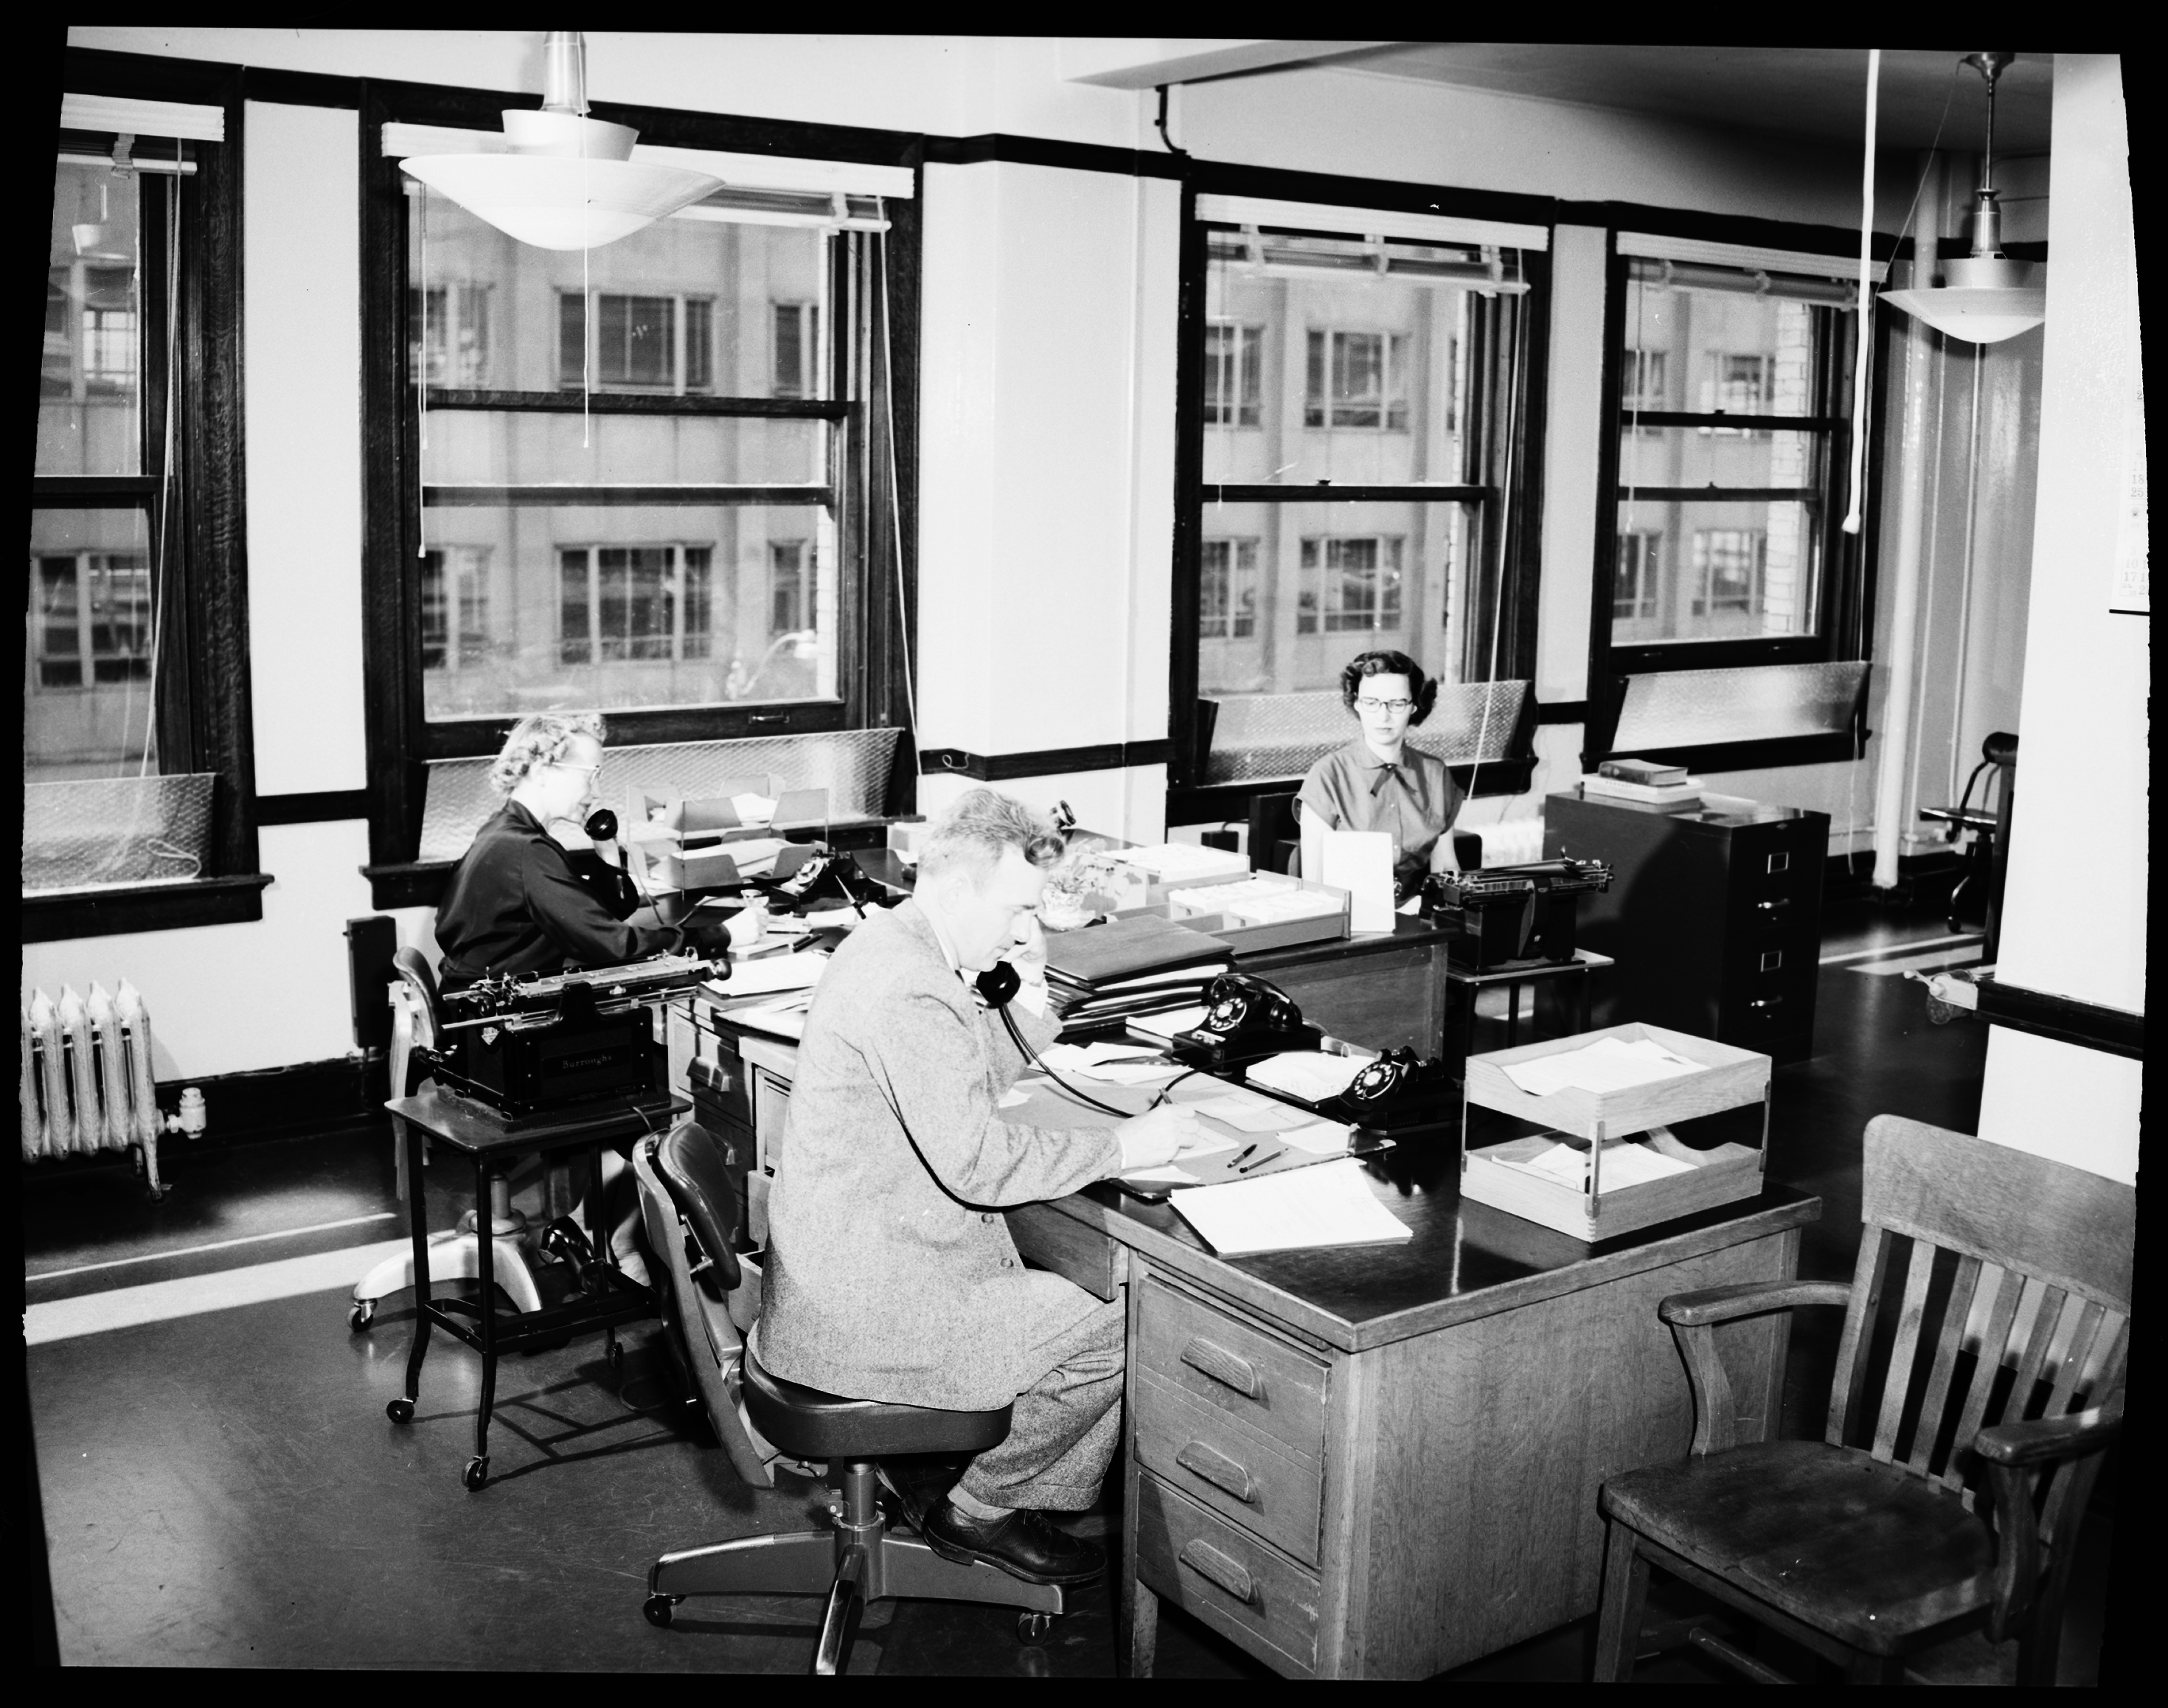 File:Seattle City Light Employees In Office, 1954